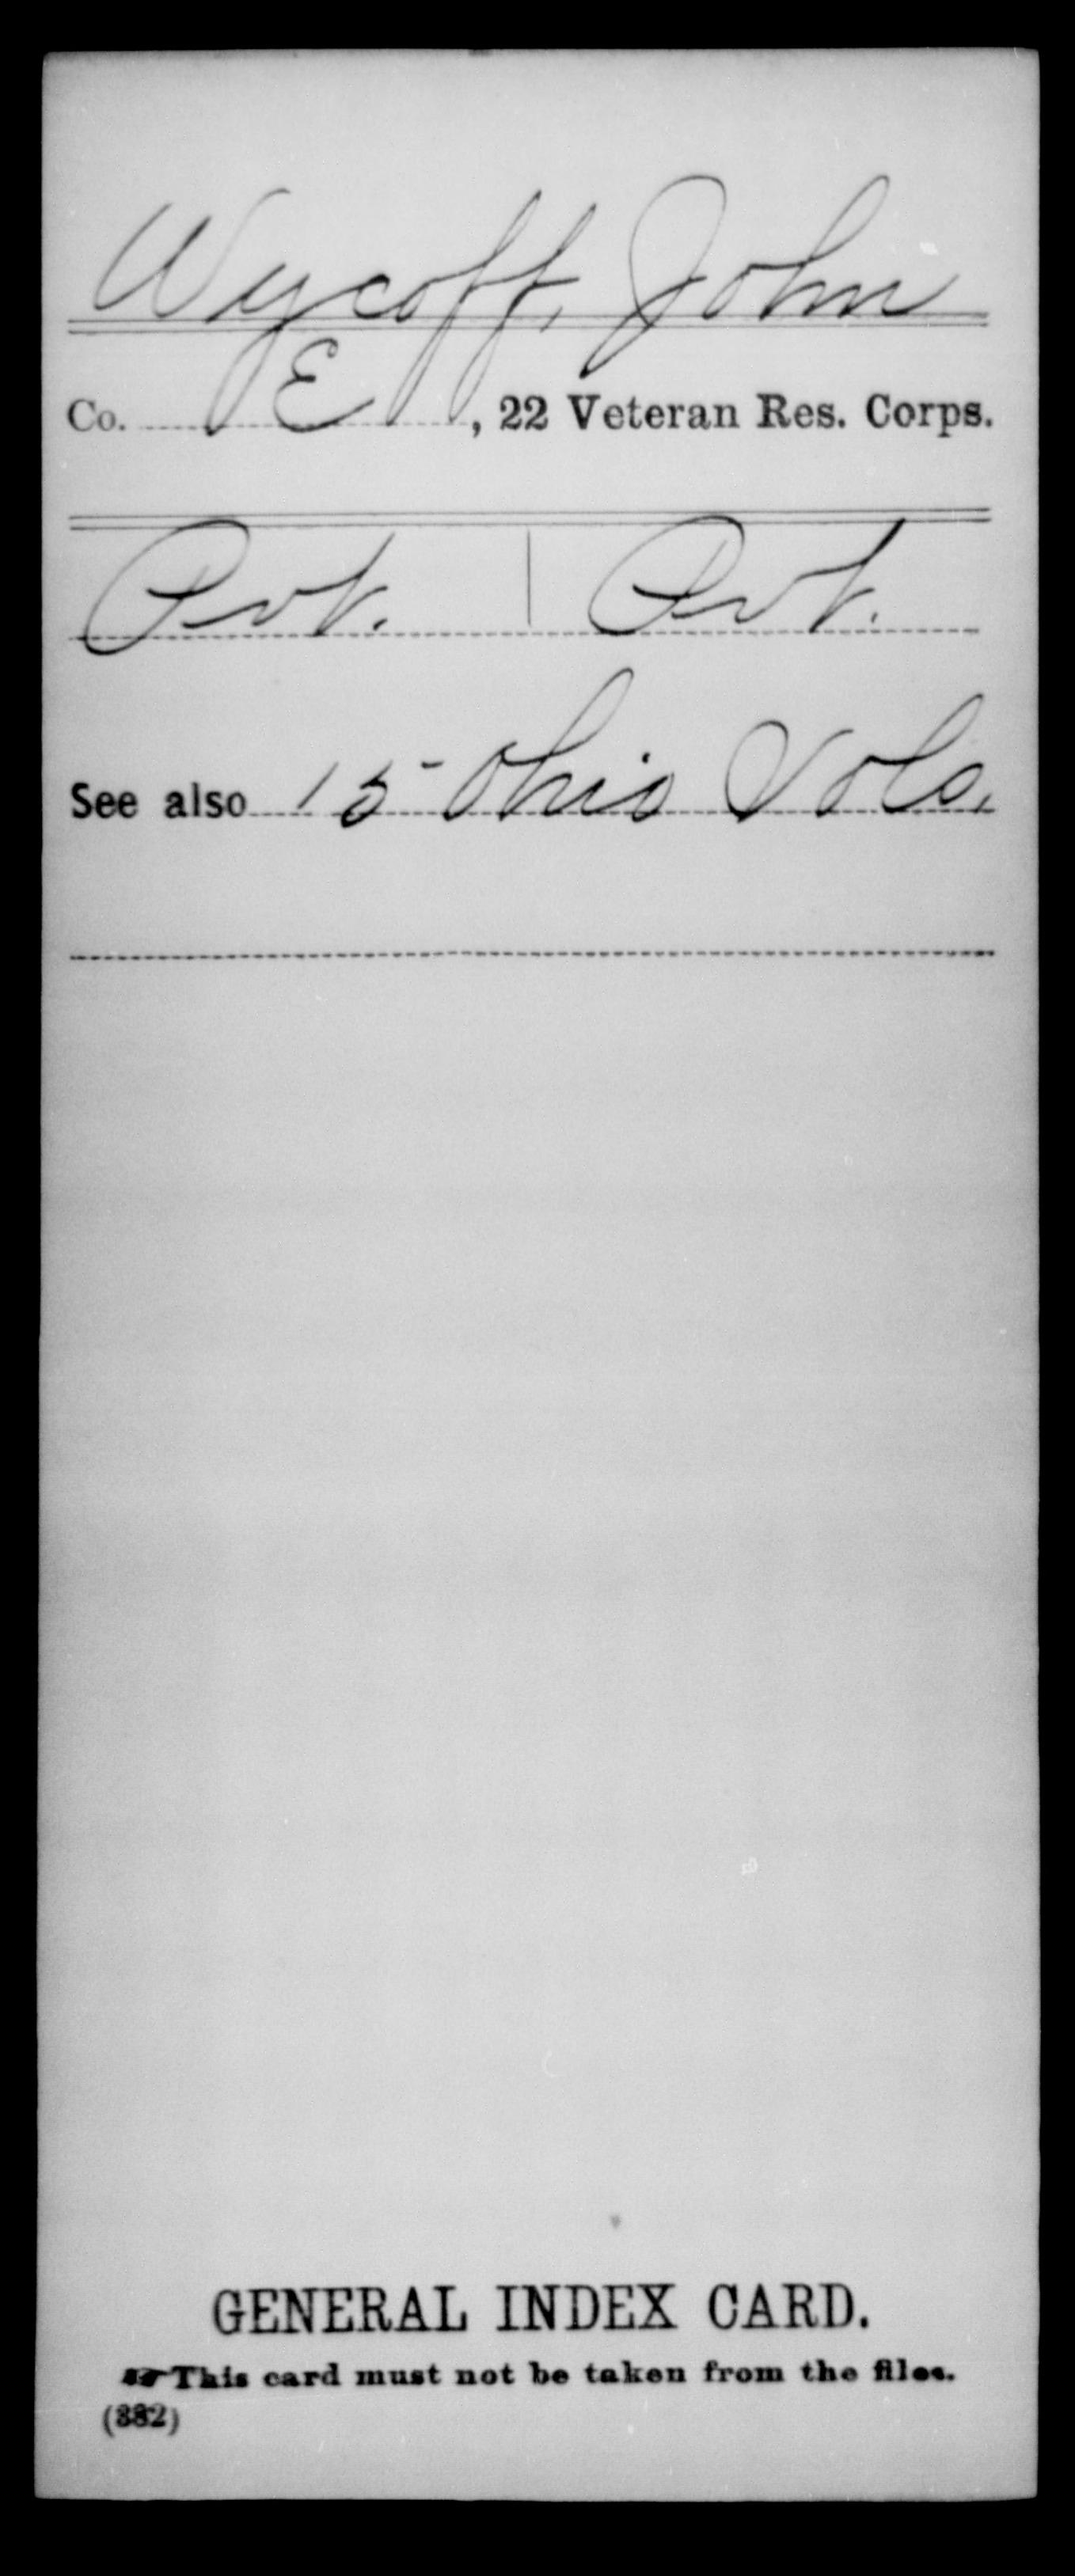 Wycoff, John - 22nd Veteran Reserve Corps, Company E